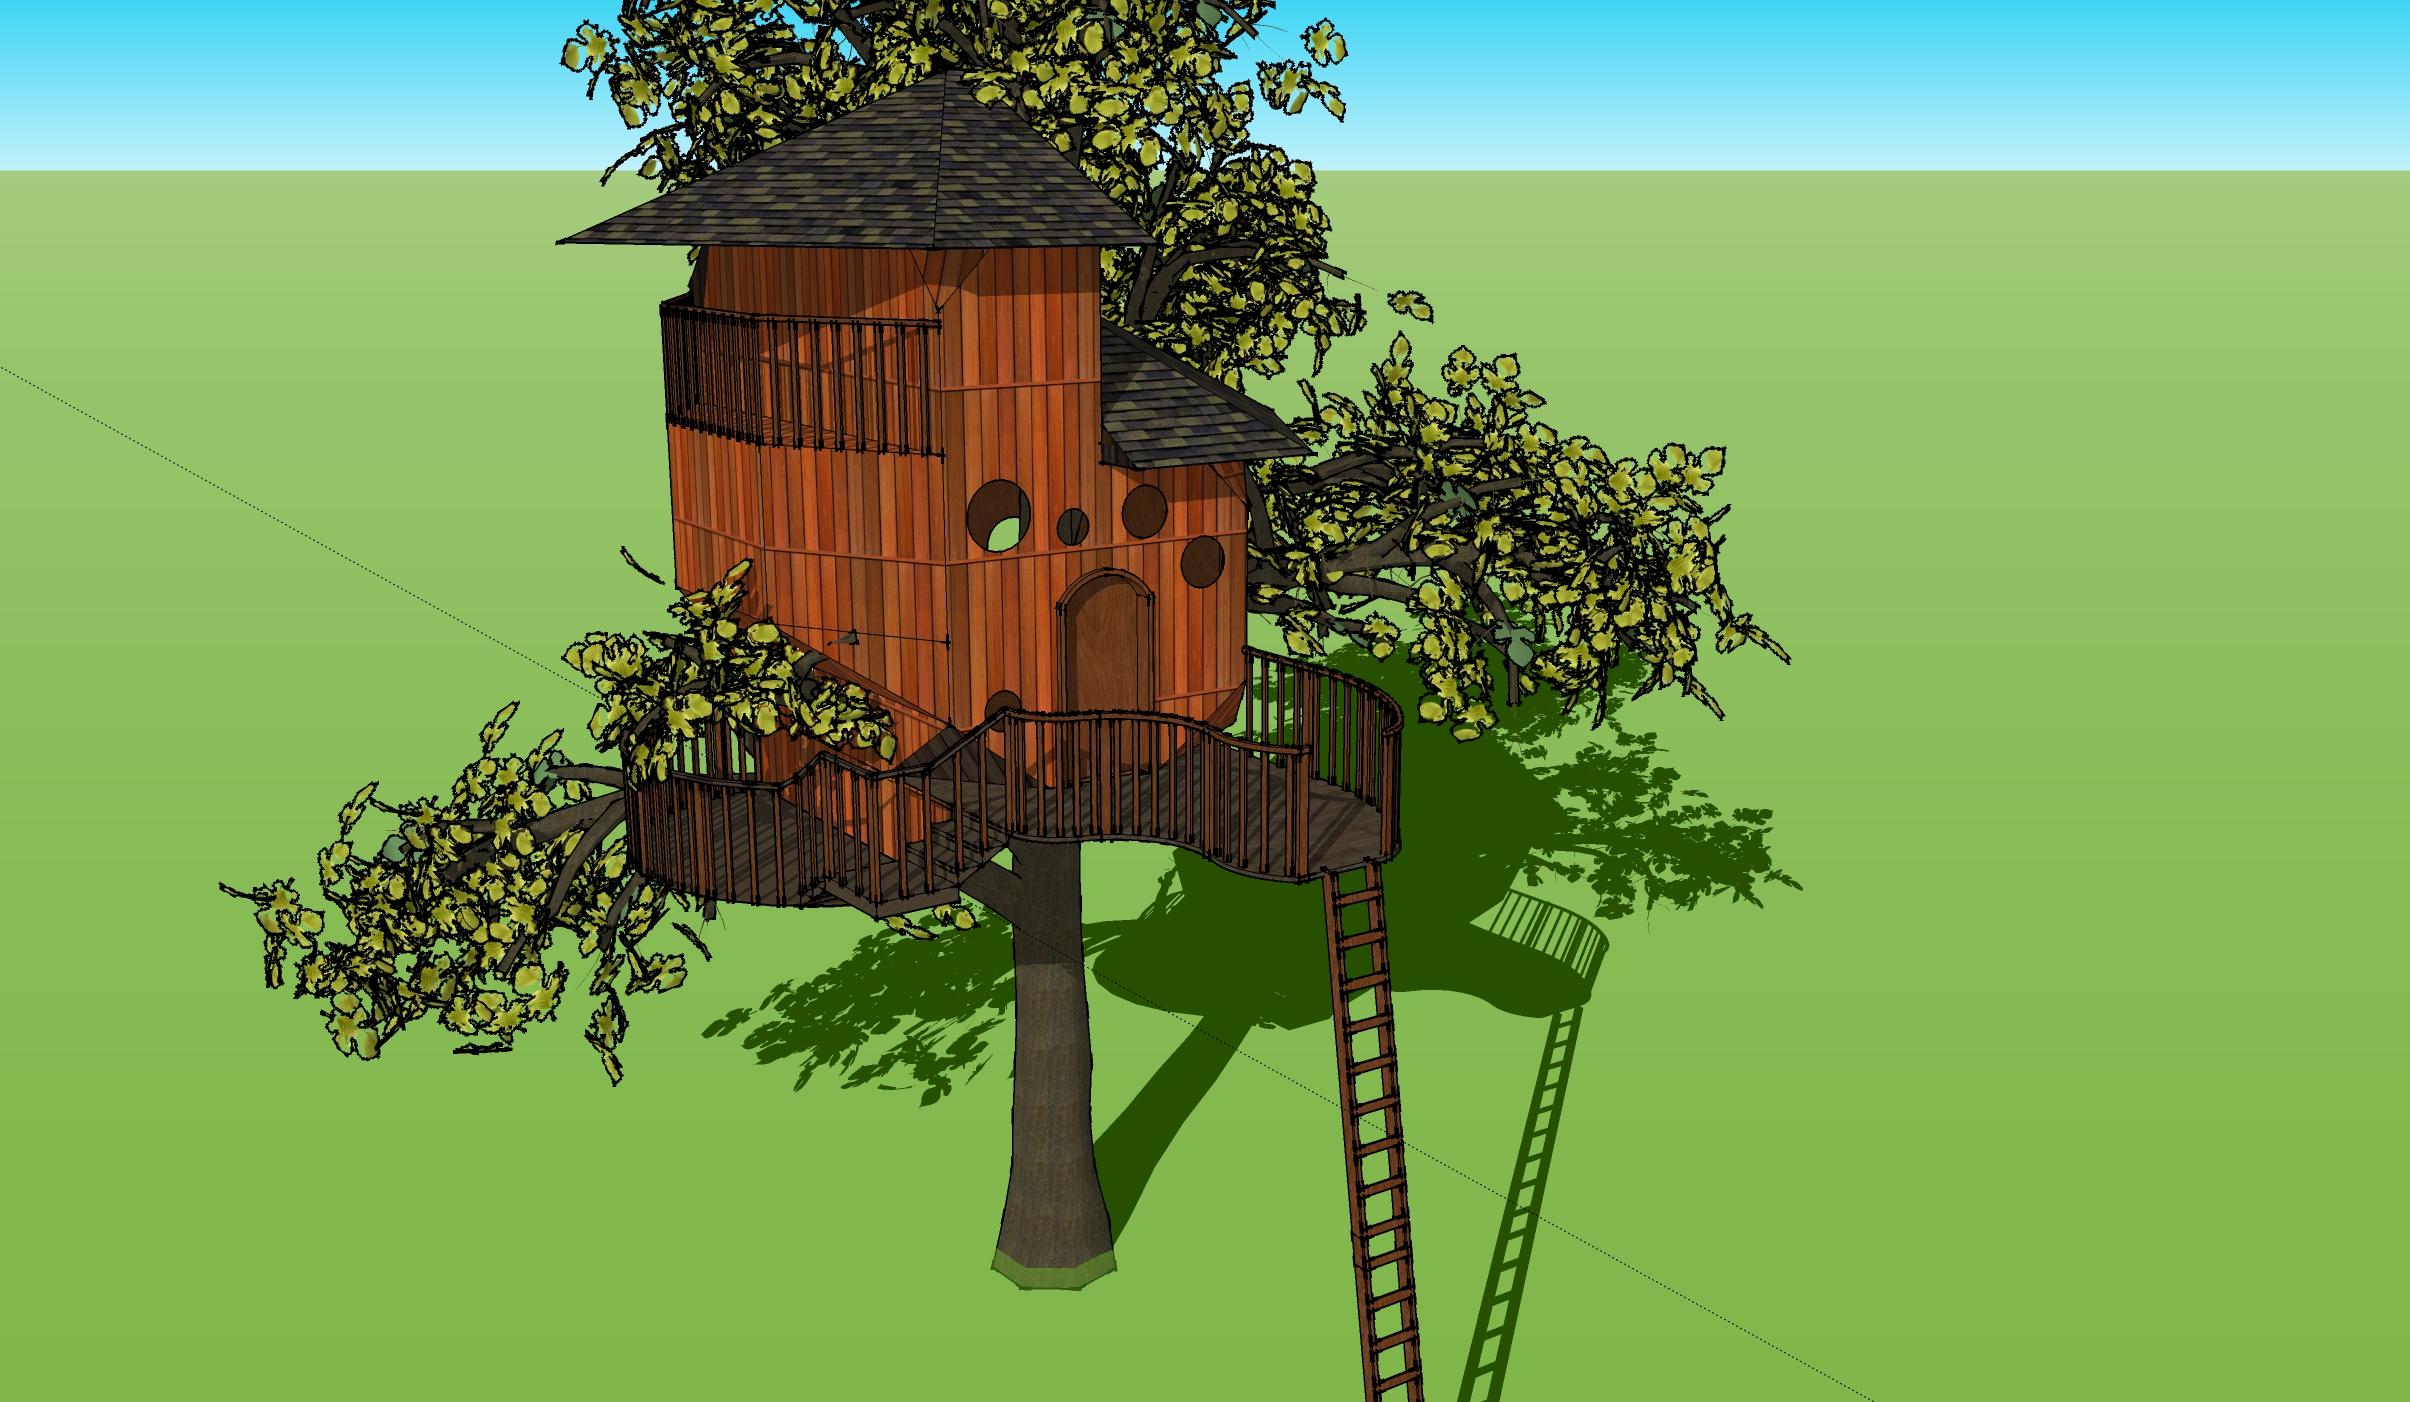 tree house mg (2).jpg